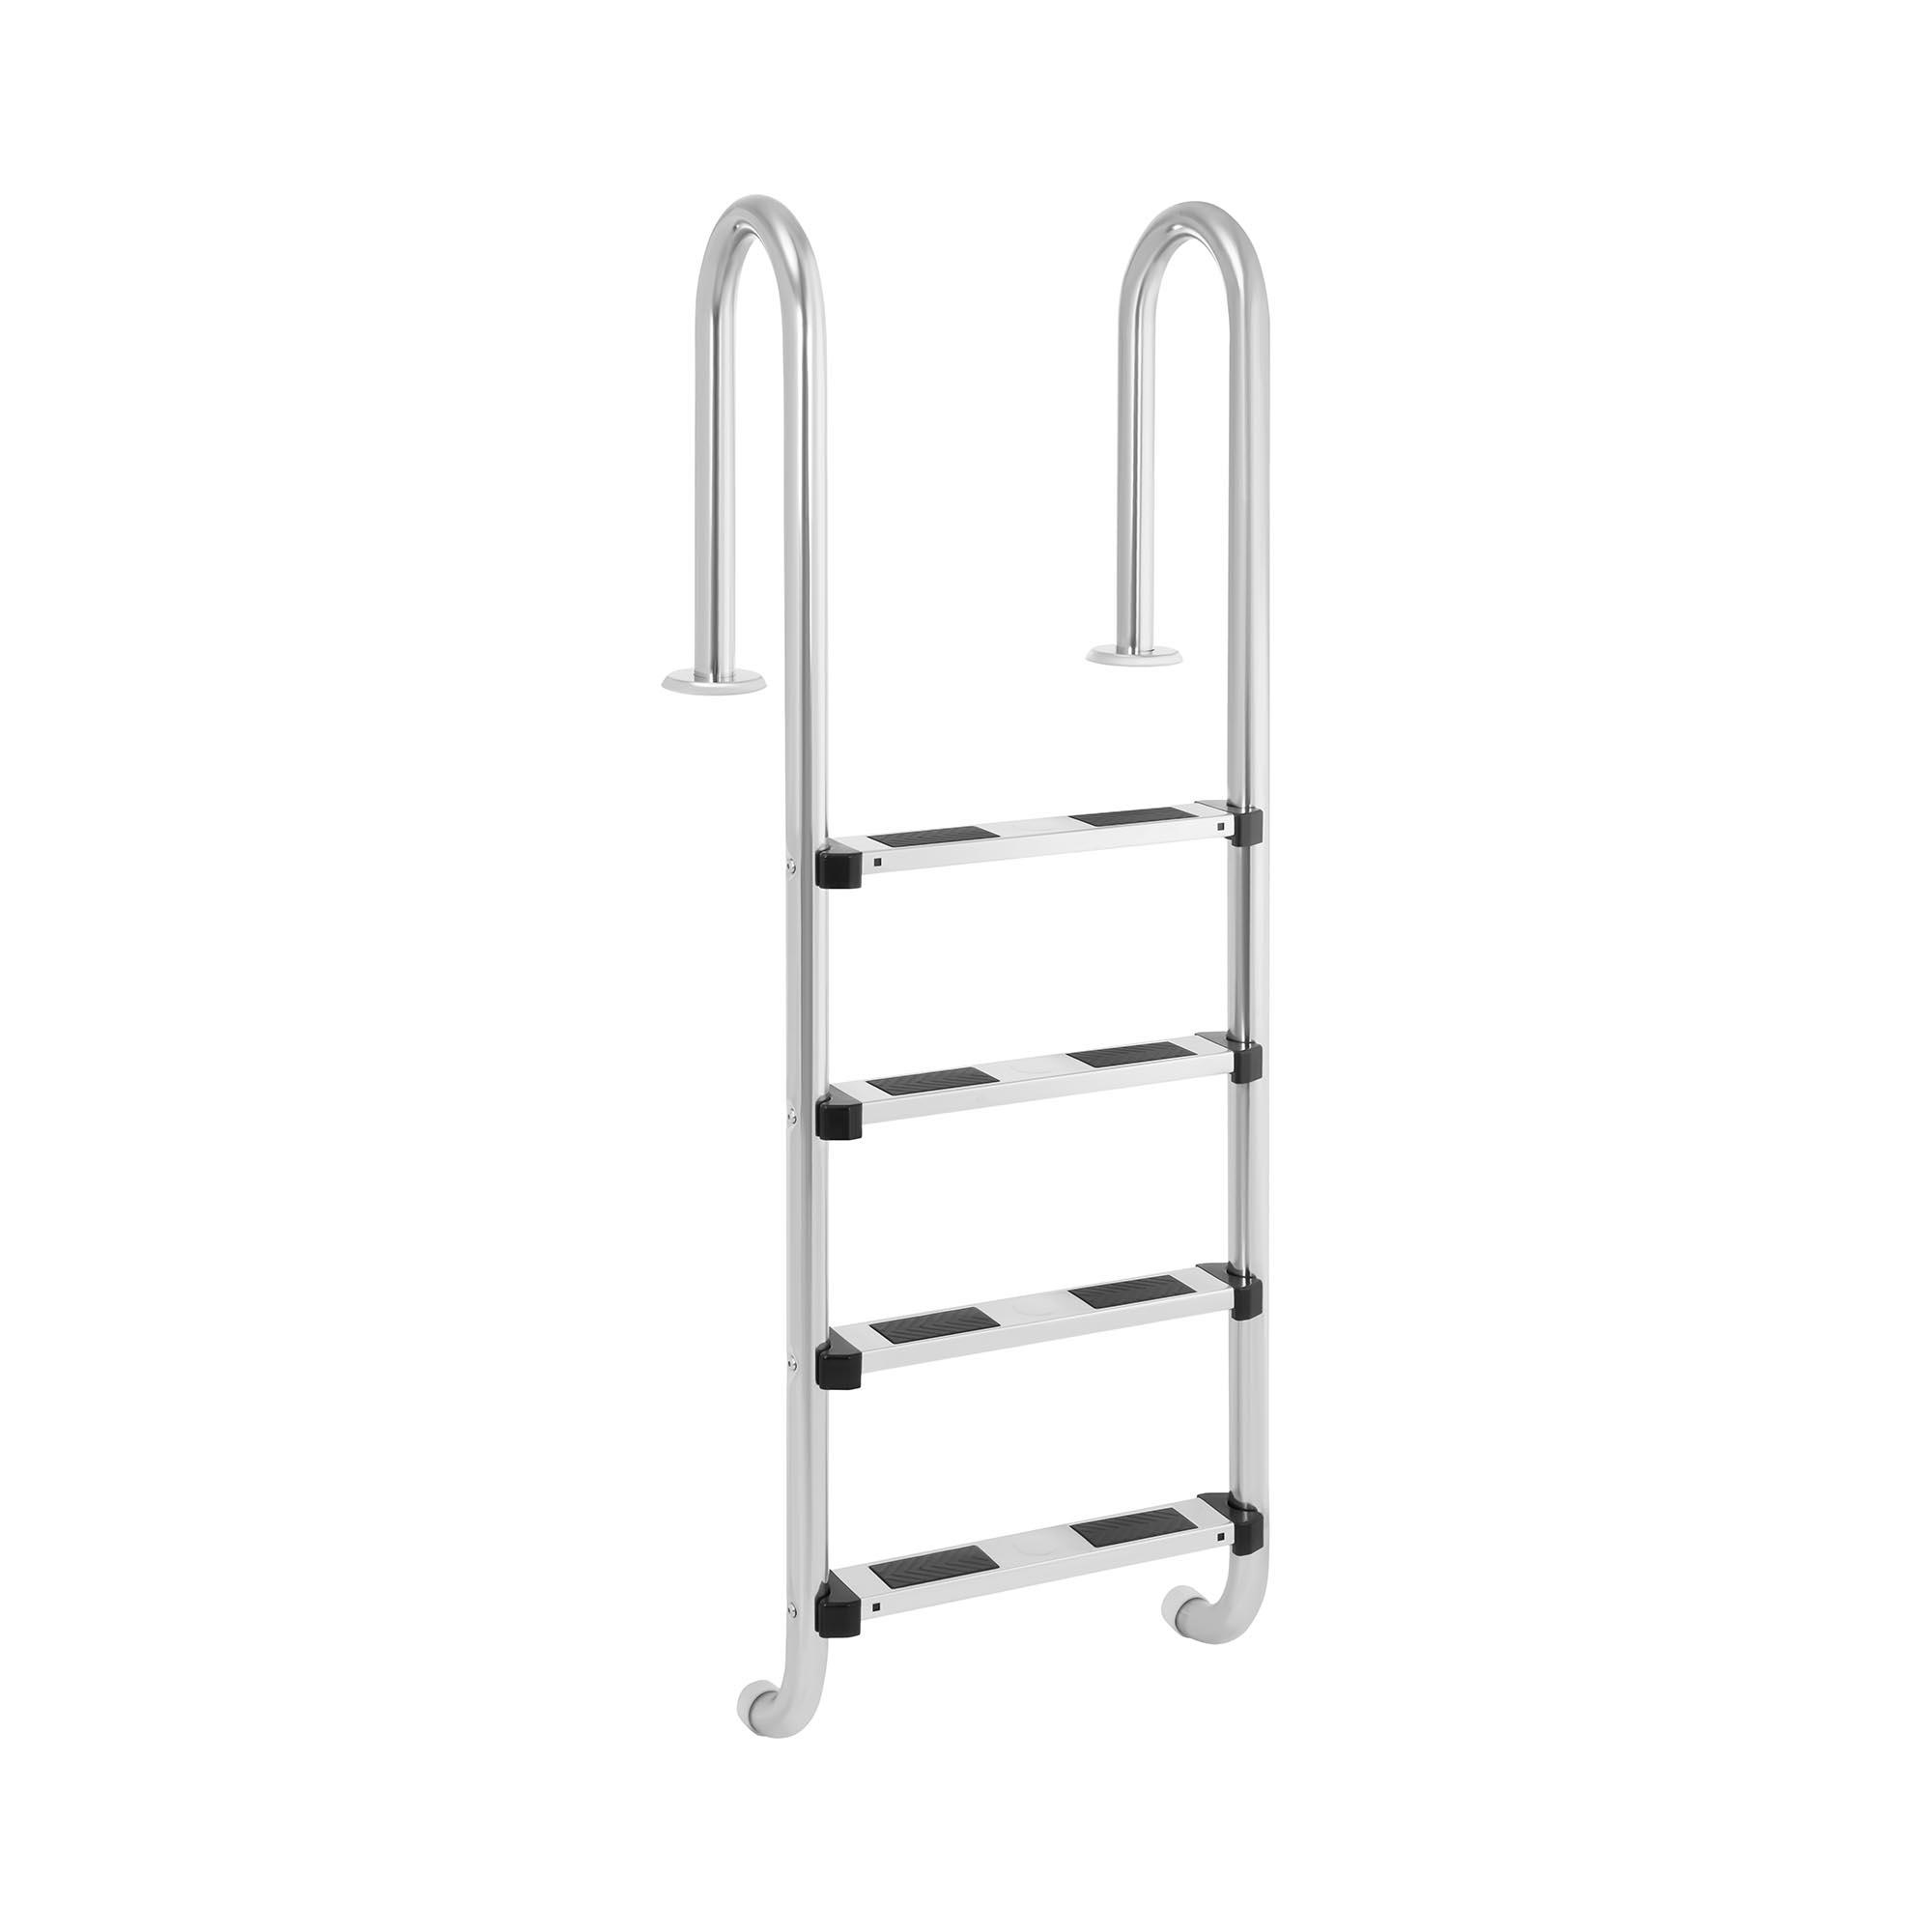 Uniprodo Poolleiter - 4 Stufen - enger Holmbogen 10250267